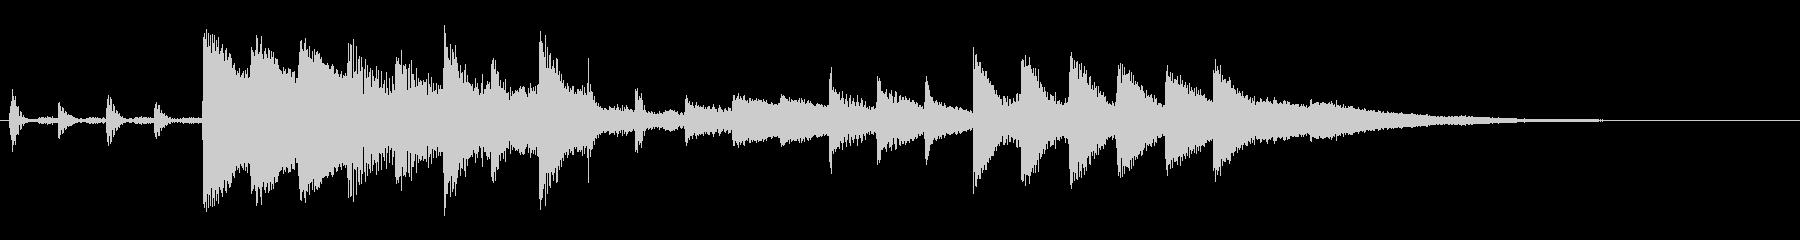 KANT近未来アラームサウンド247の未再生の波形